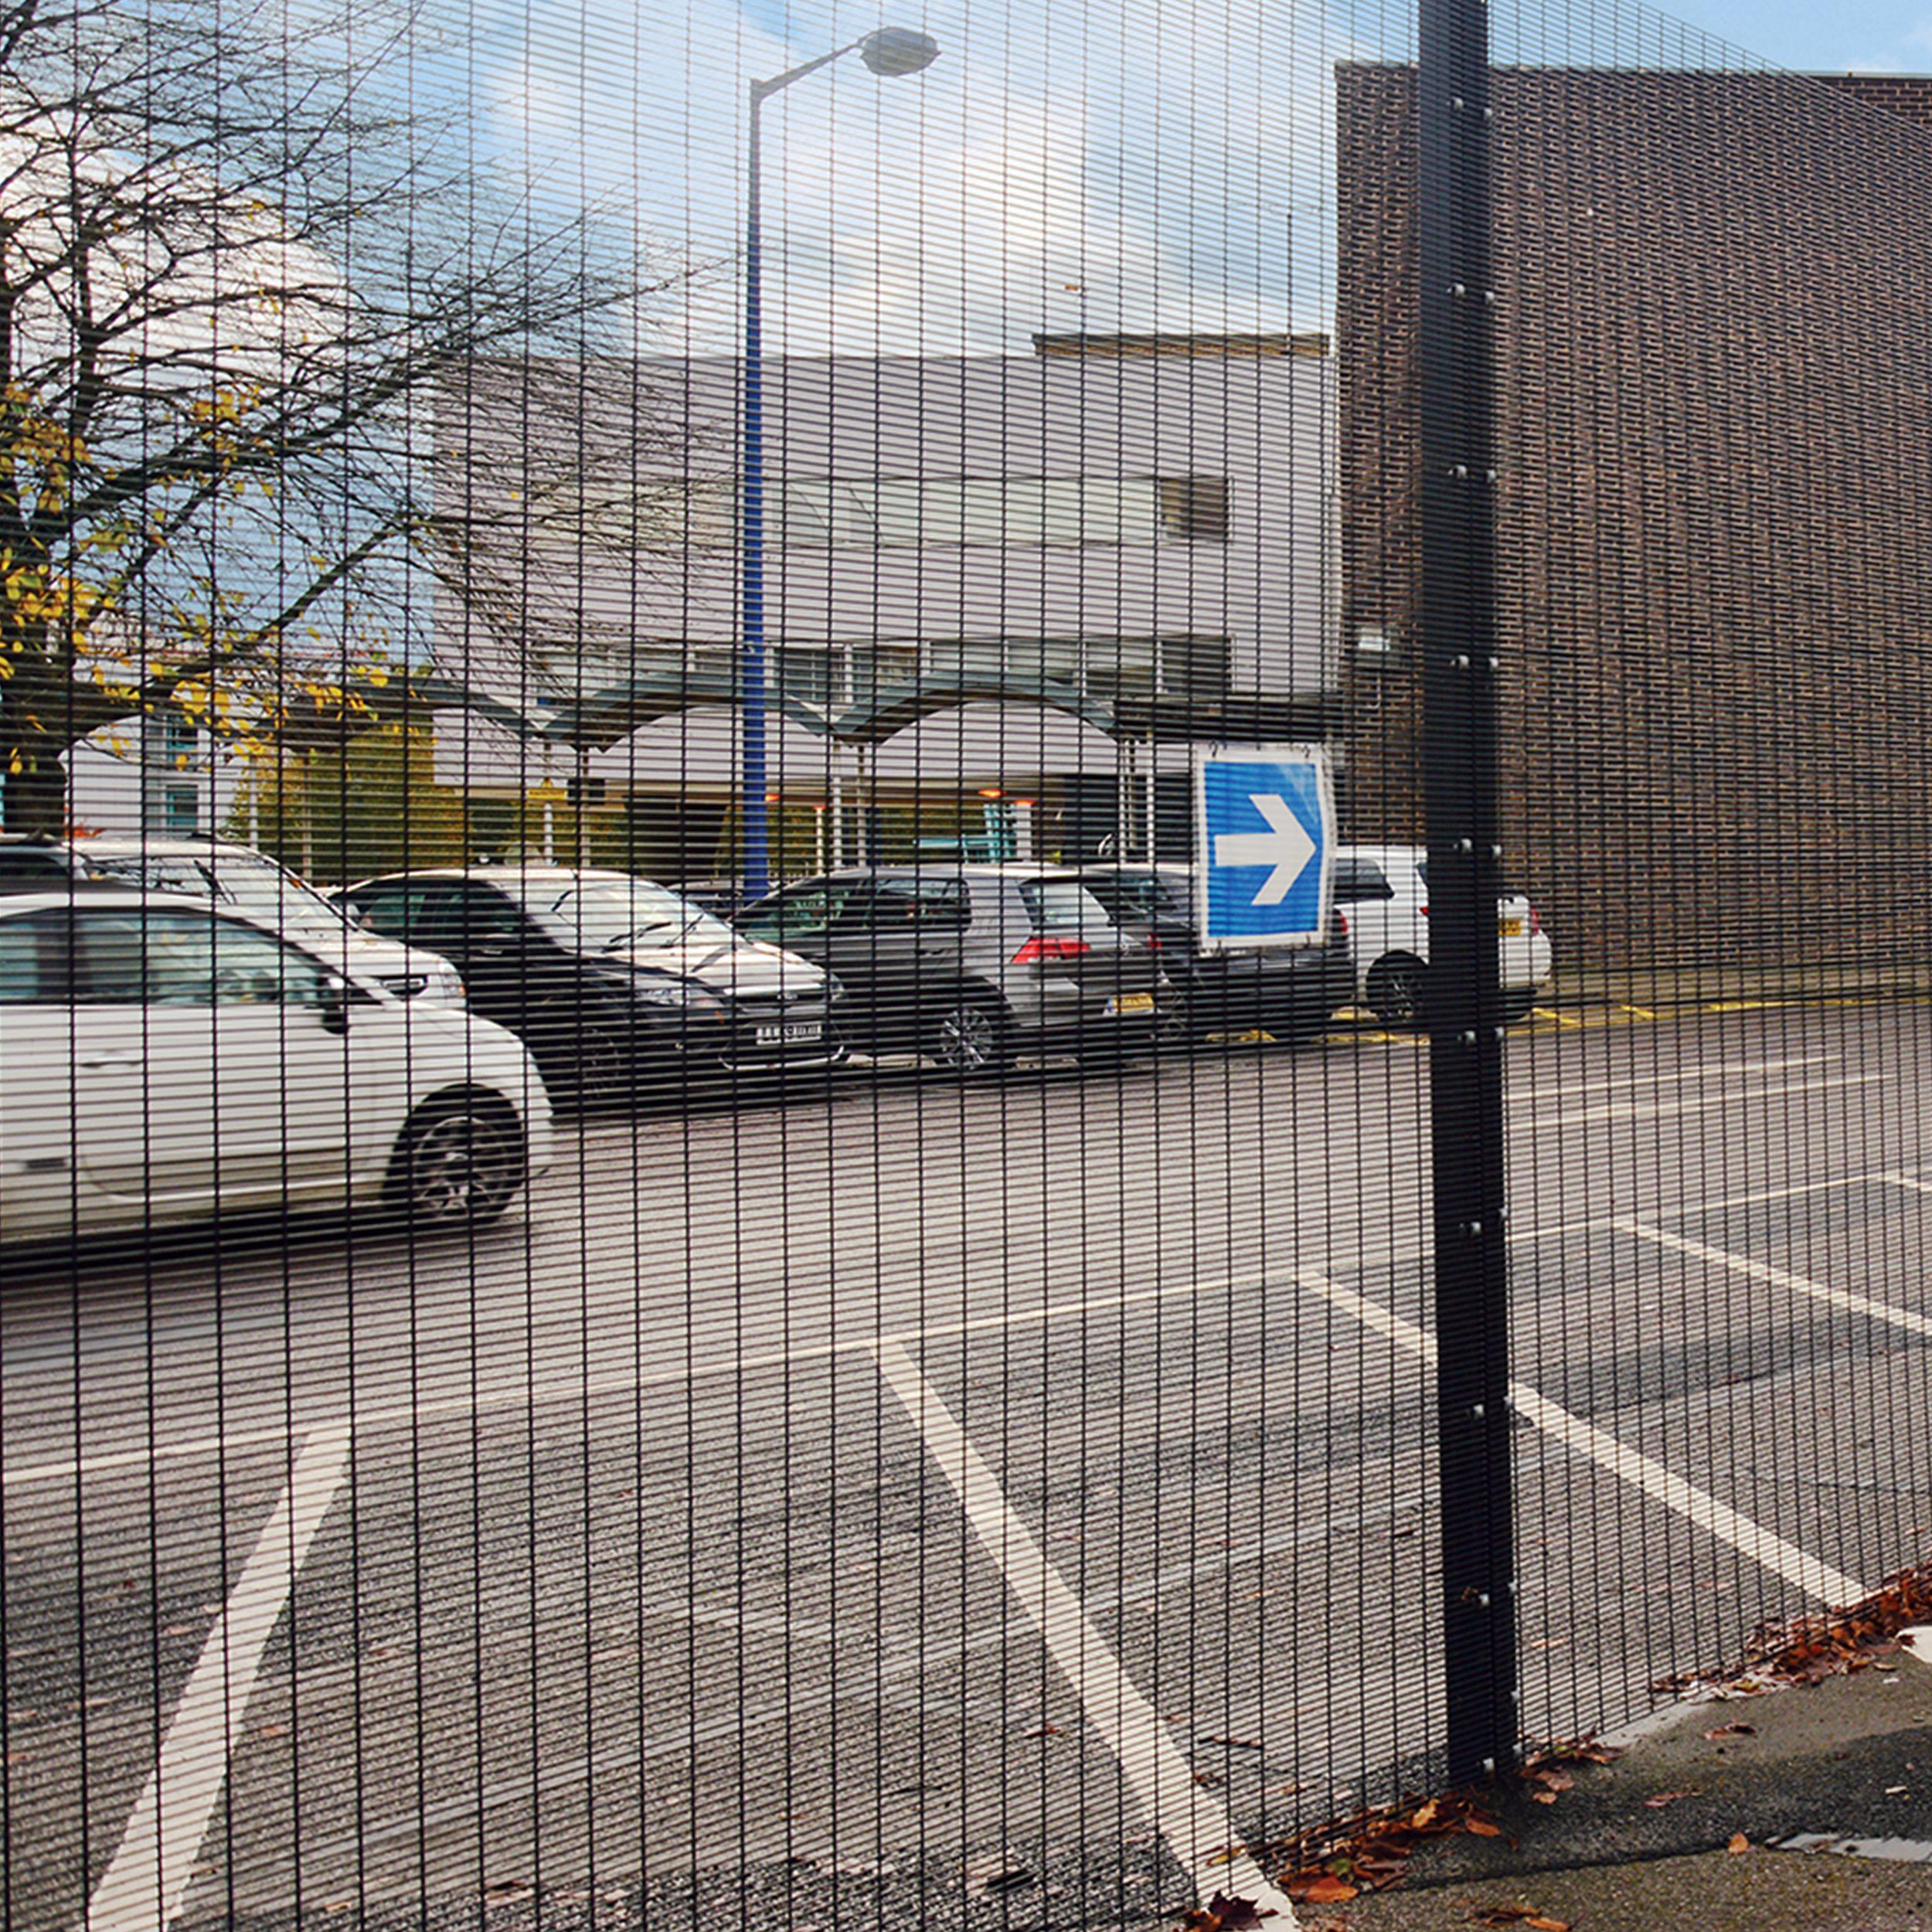 Large fence inside a MET police training center